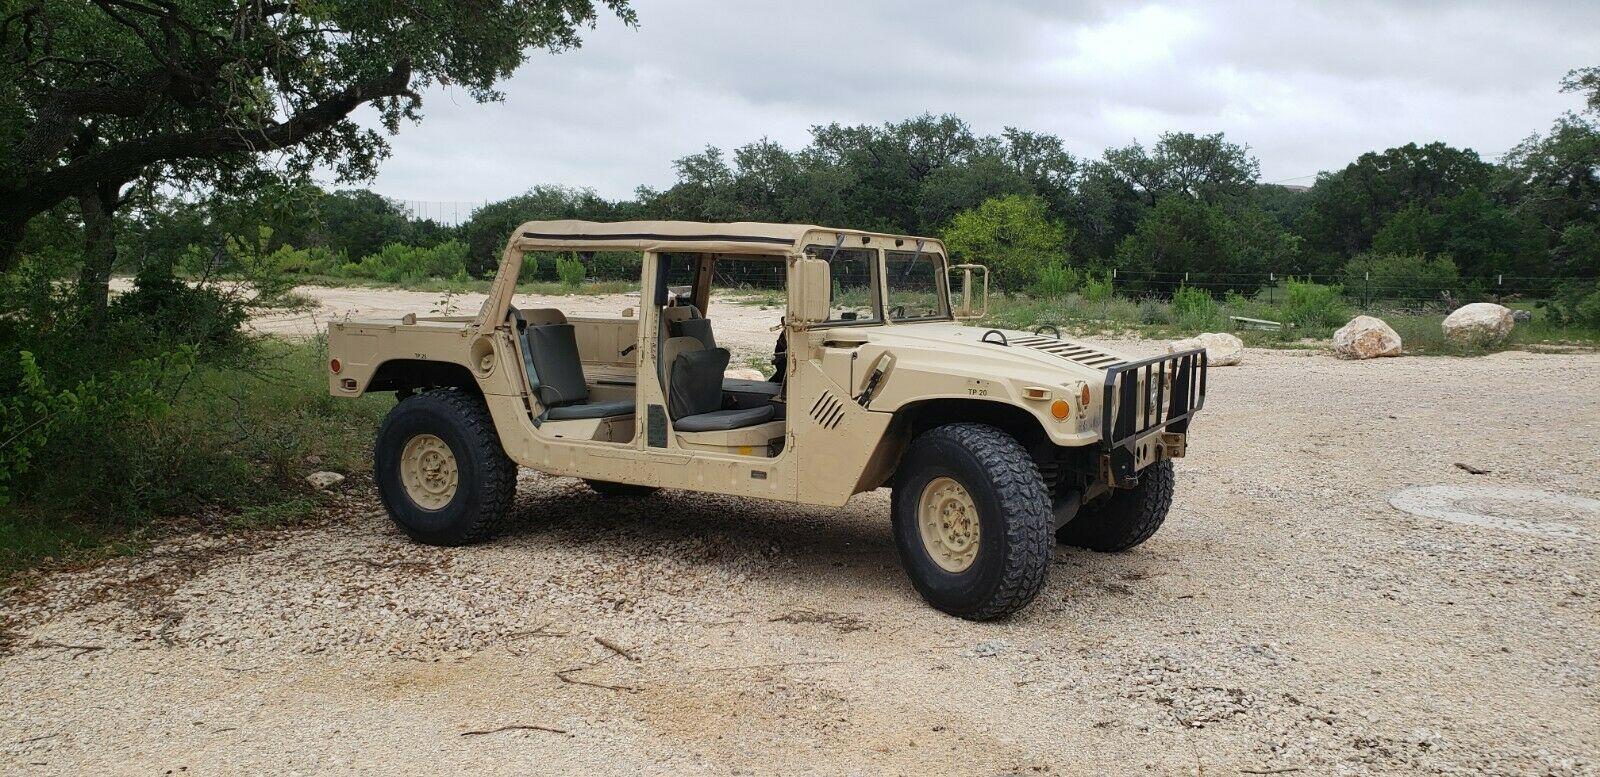 mostly original 1989 AM General M998 Humvee Hummer military